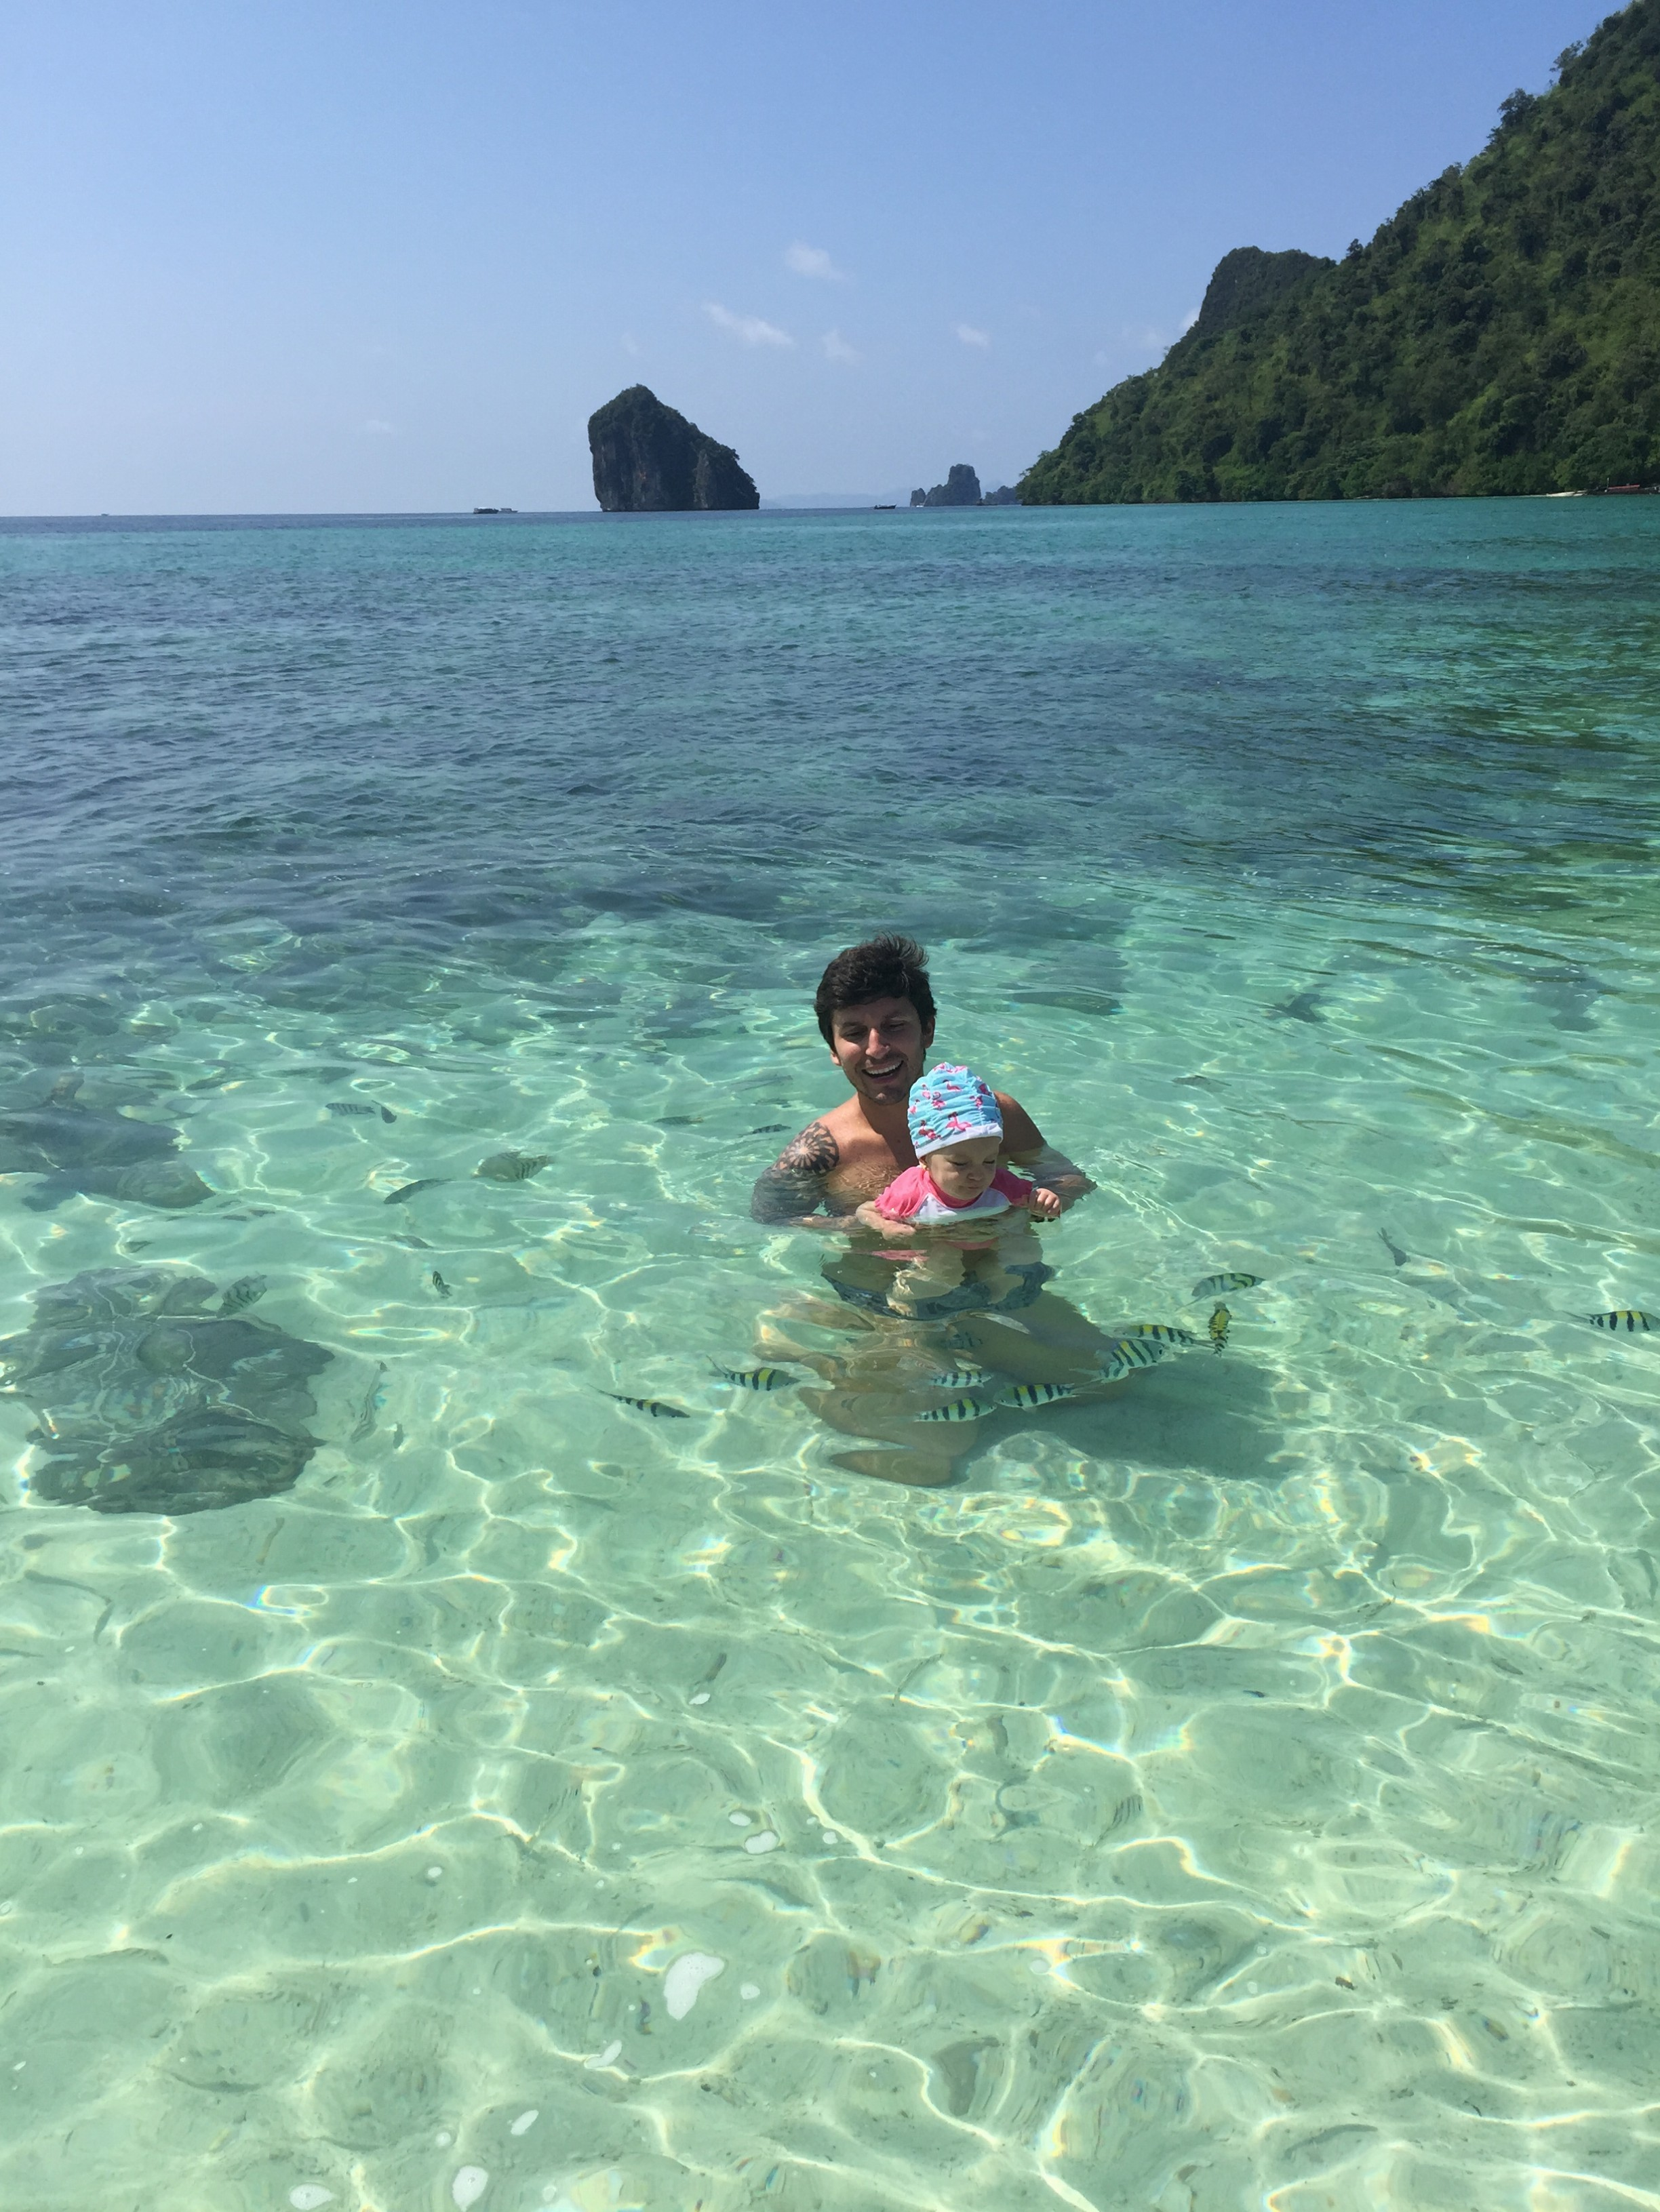 Tup island krabi